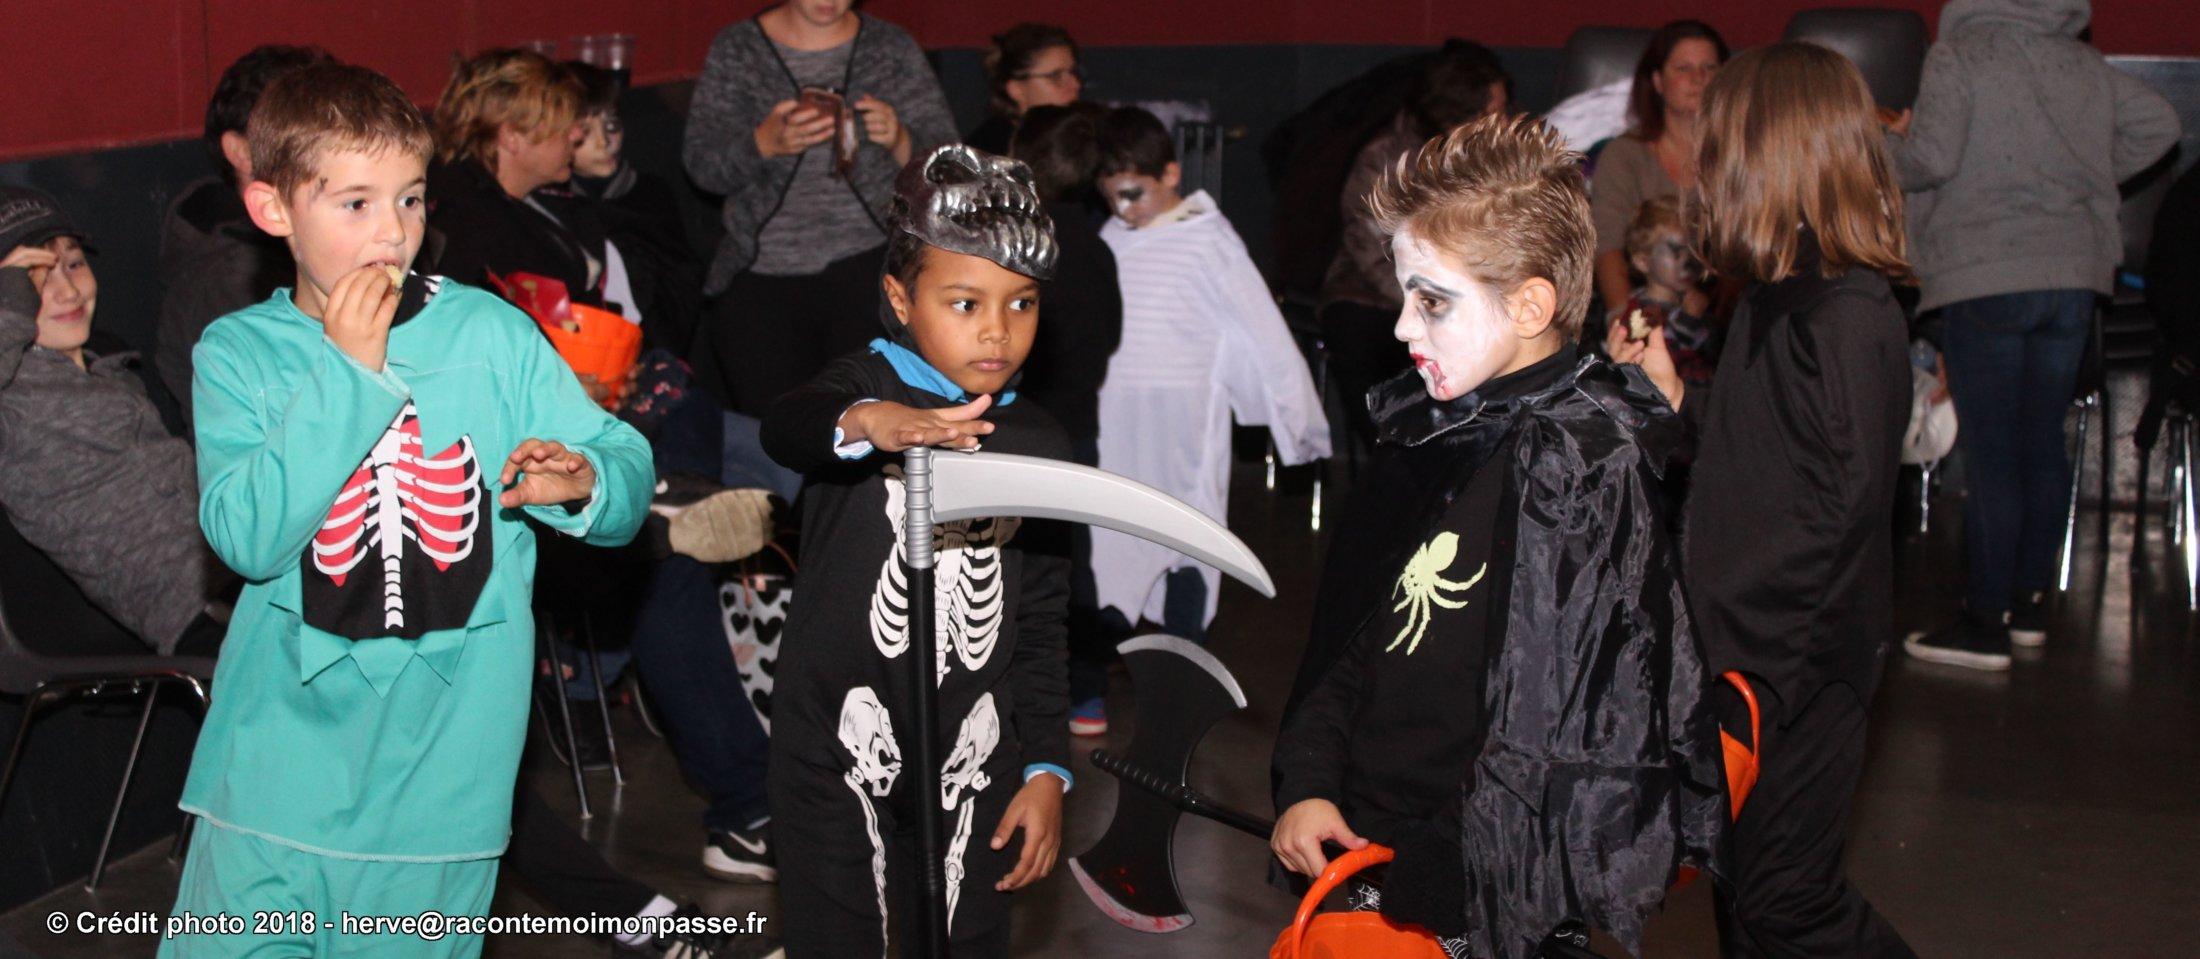 06 - Halloween 2018